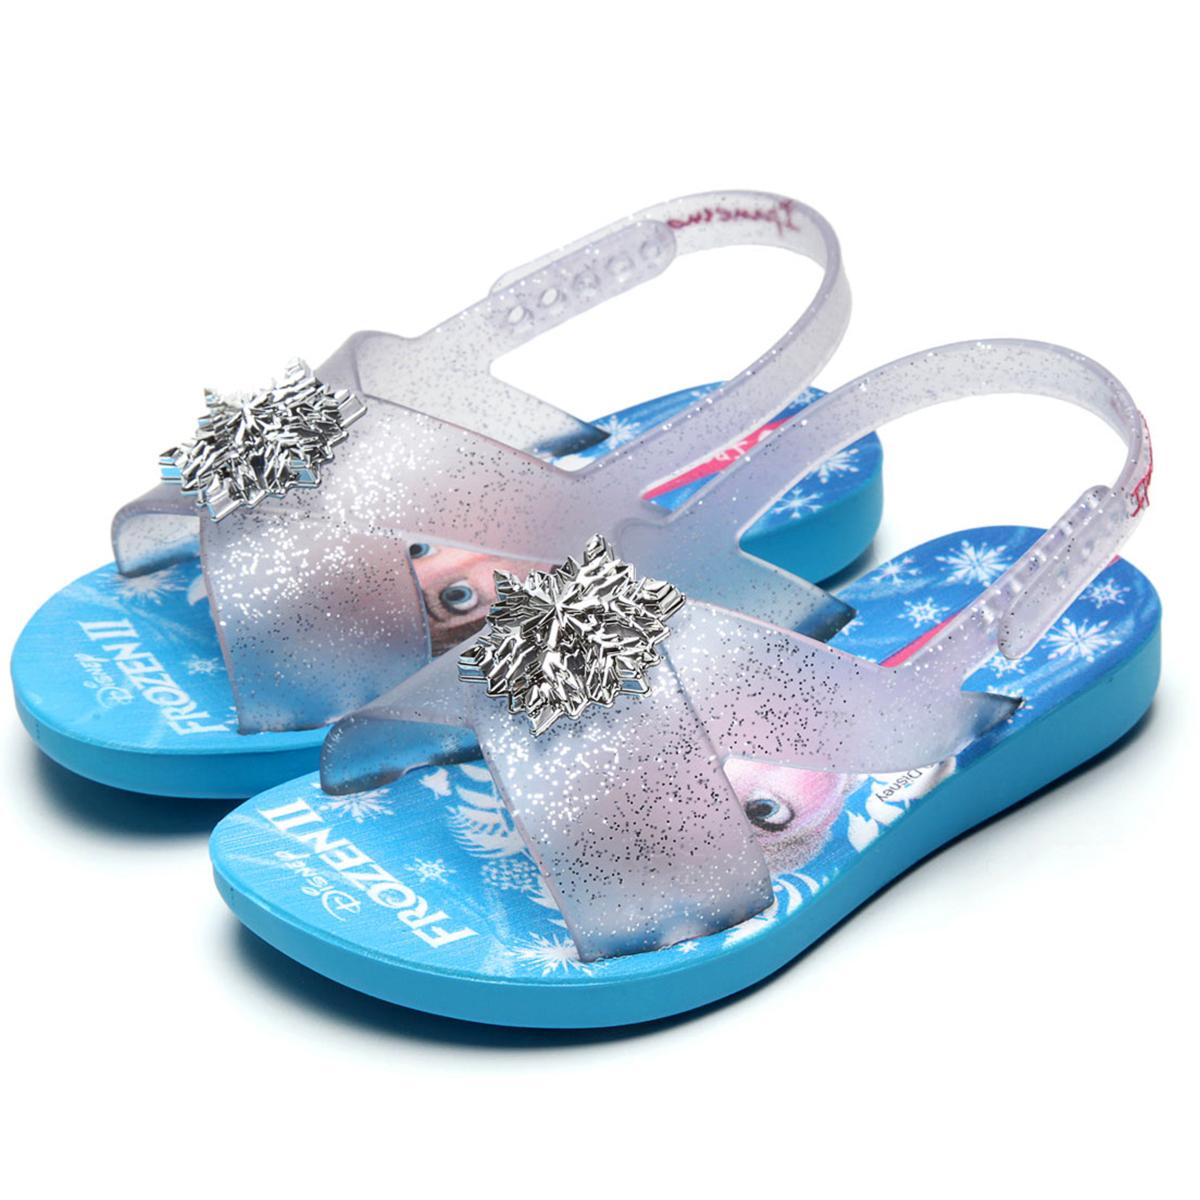 Sandália Ipanema Kids Infantil Frozen 2 - Azul